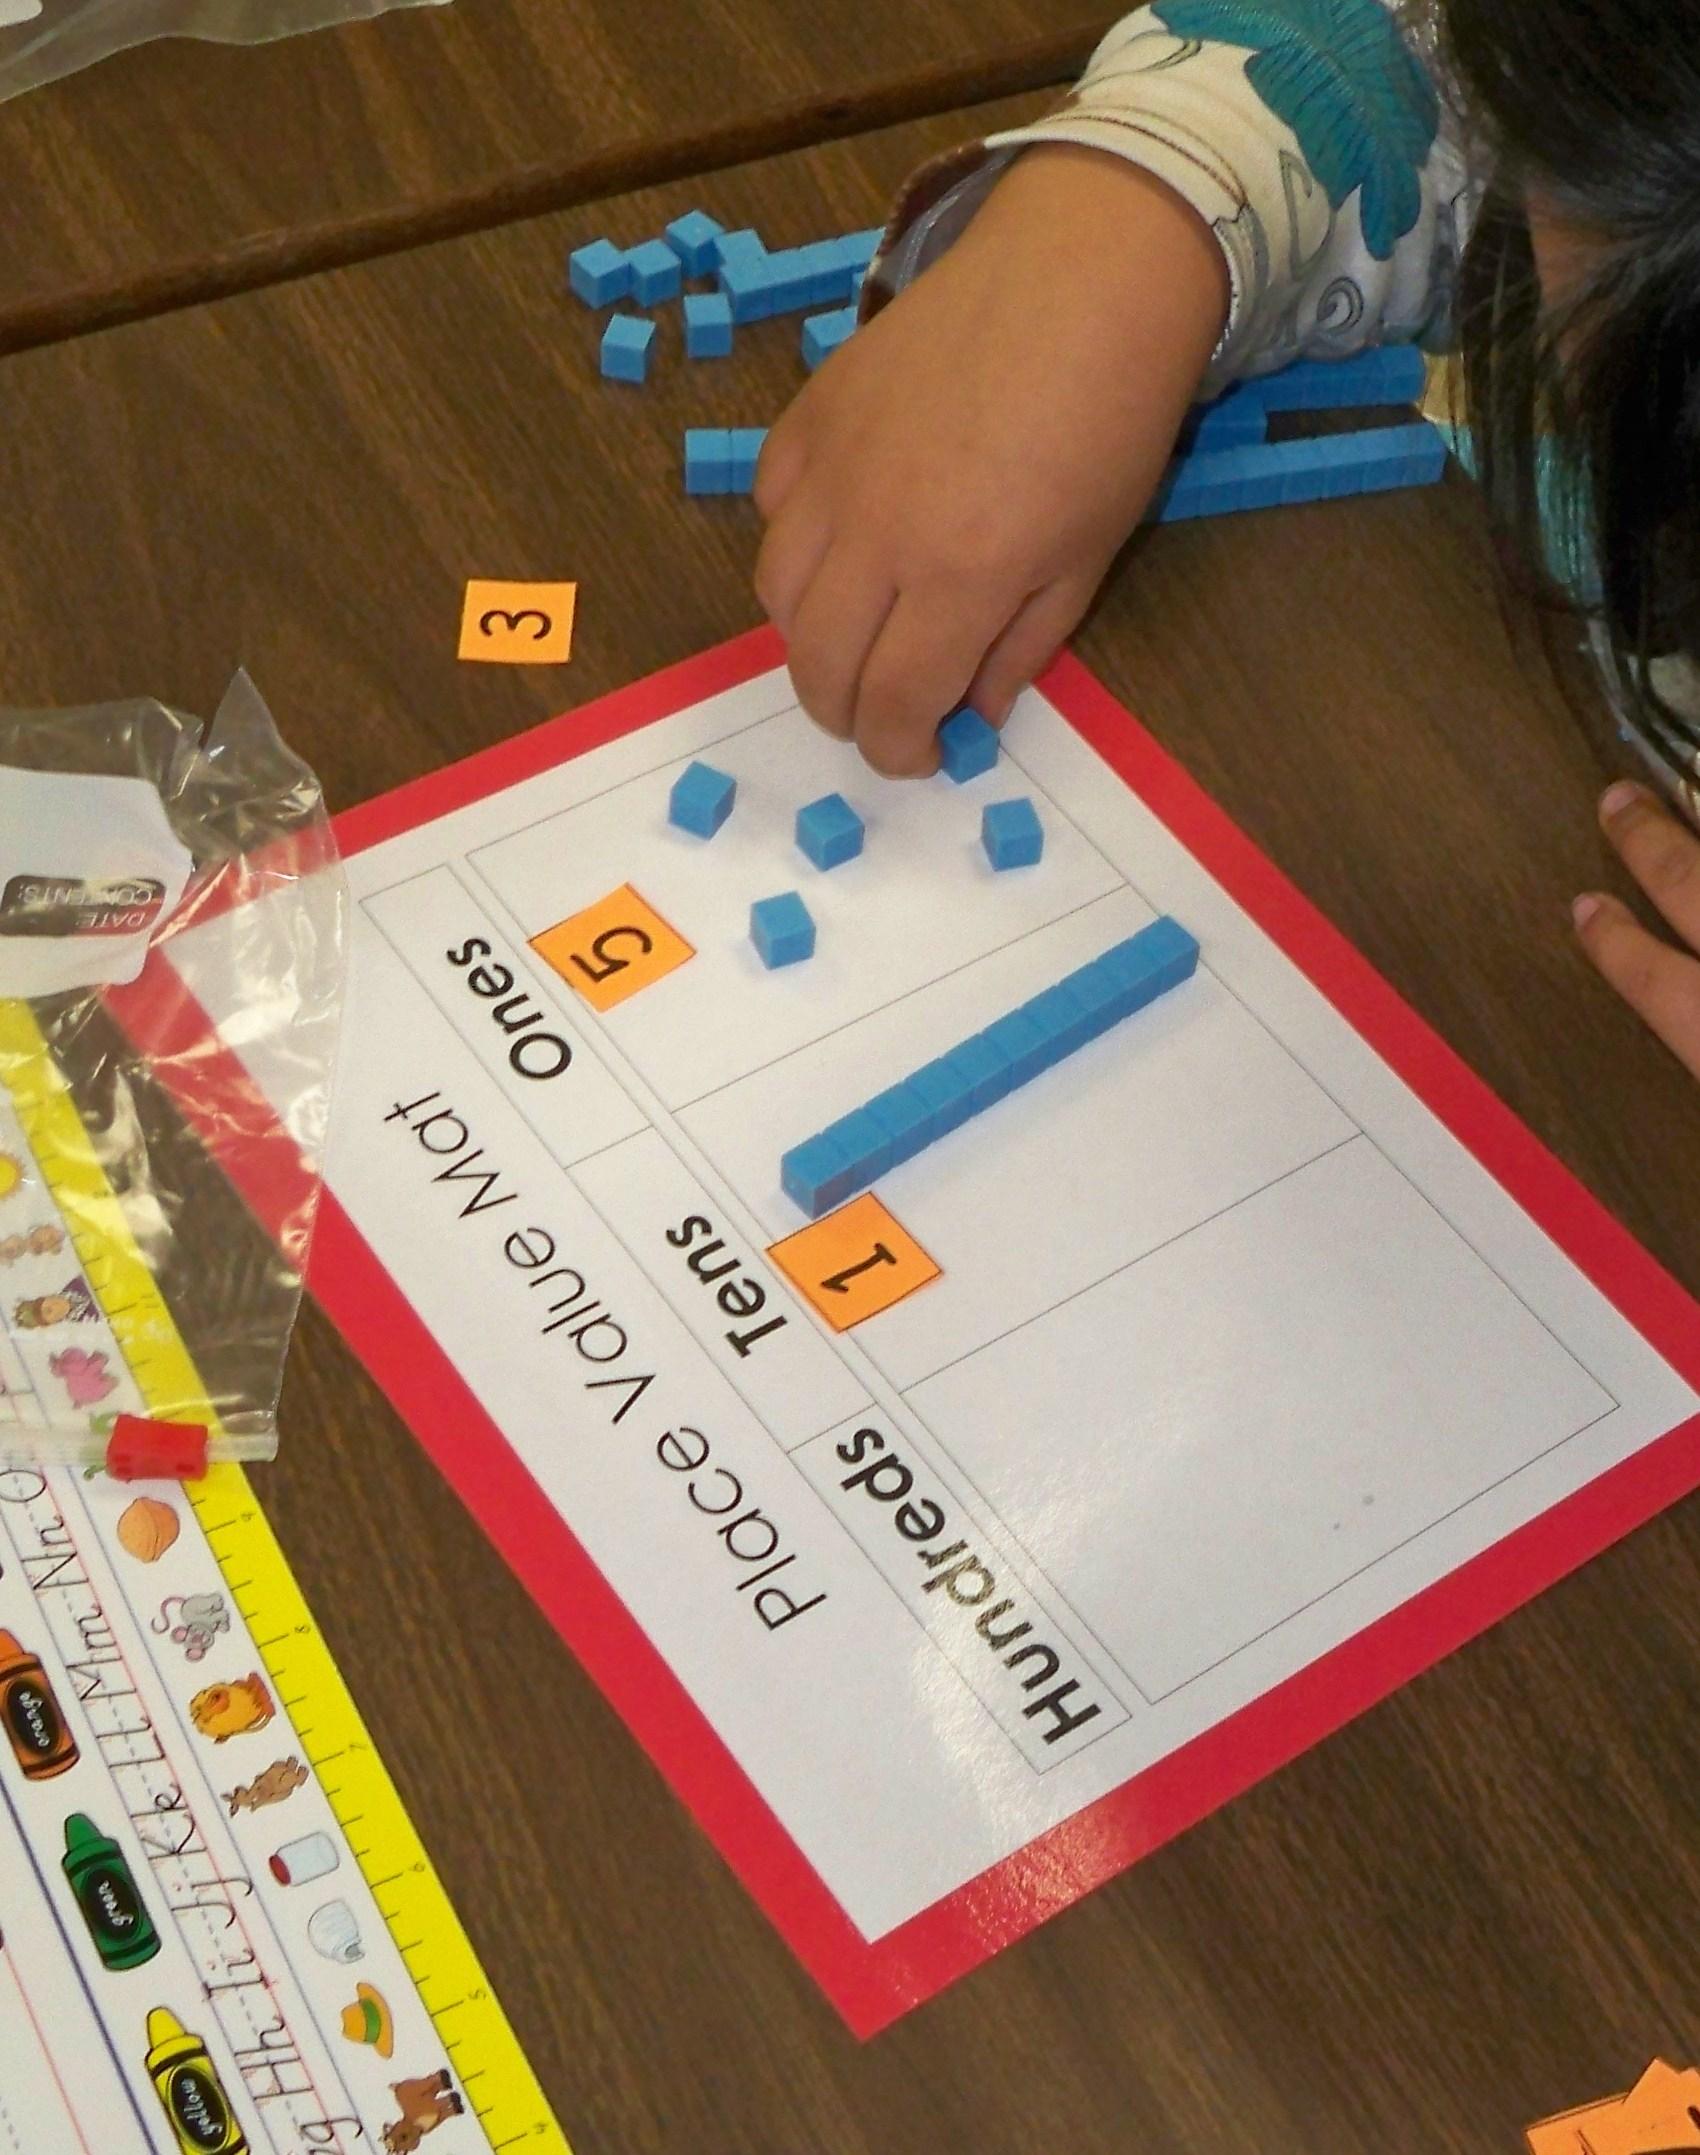 math worksheet : 1st grade math worksheets and information for parents : Quick Math Worksheets